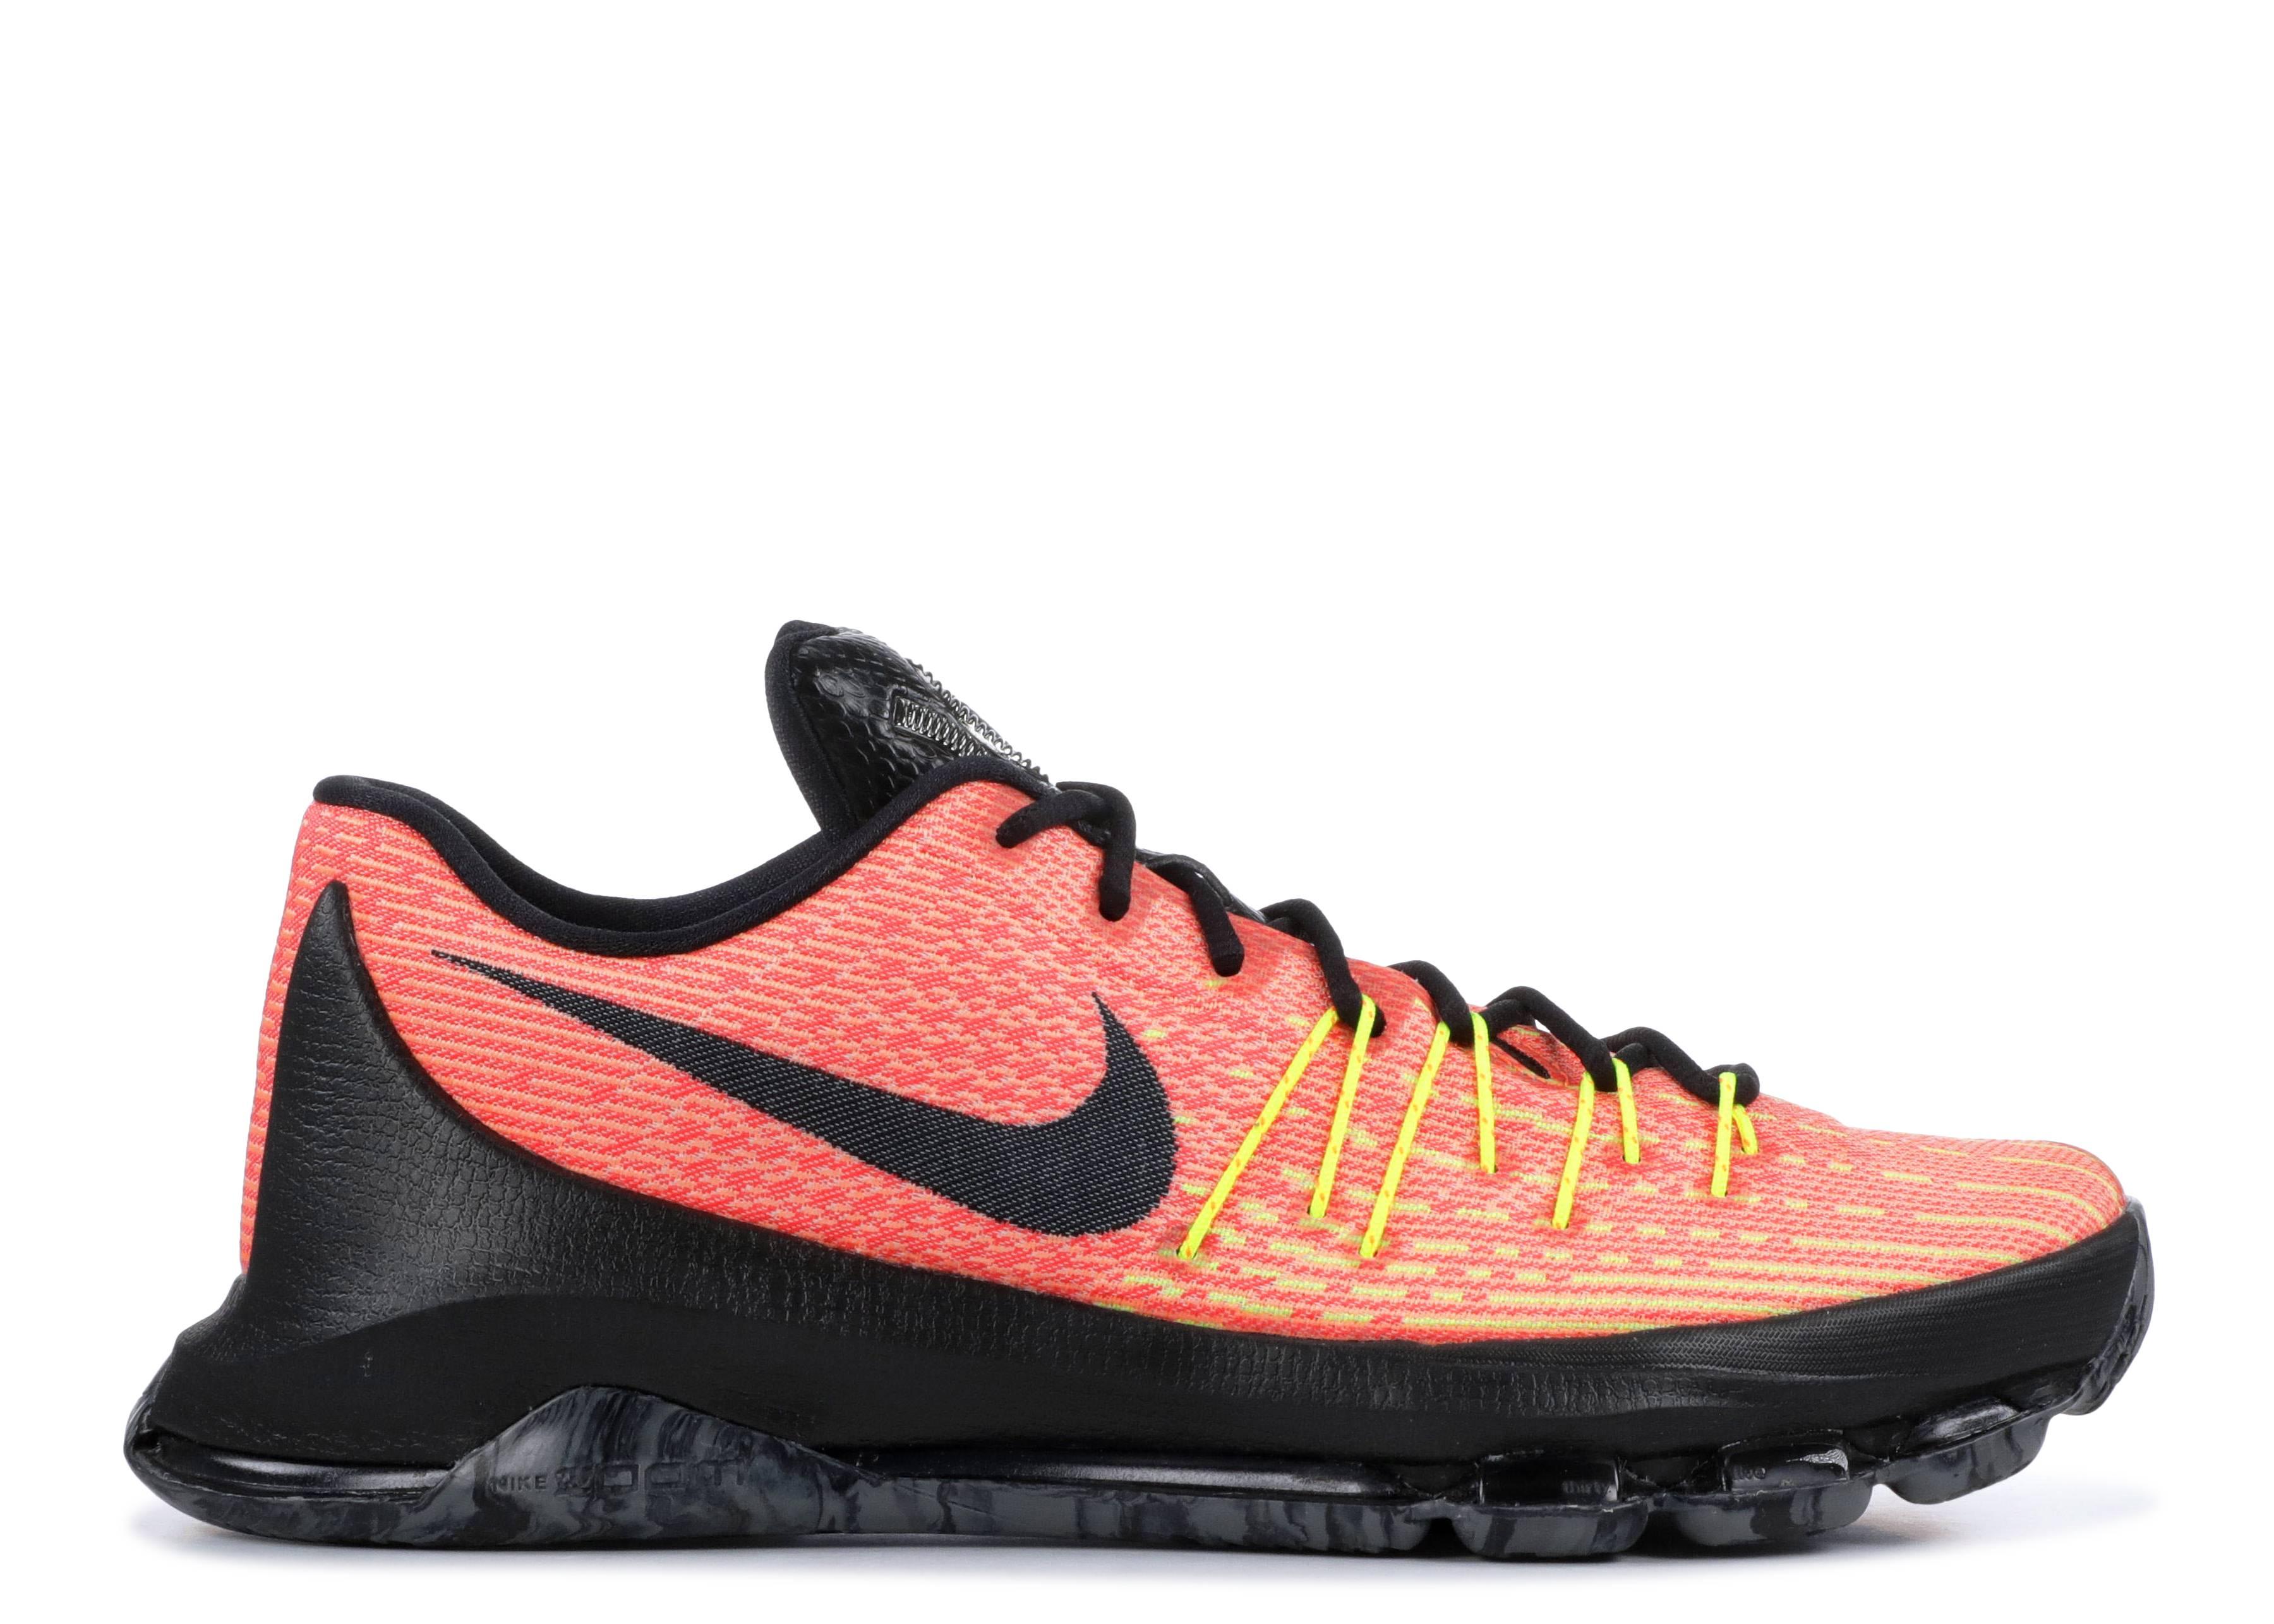 check out 2de00 68818 Kd 8 - Nike - 749375 807 - total orange black volt bright crimson ...